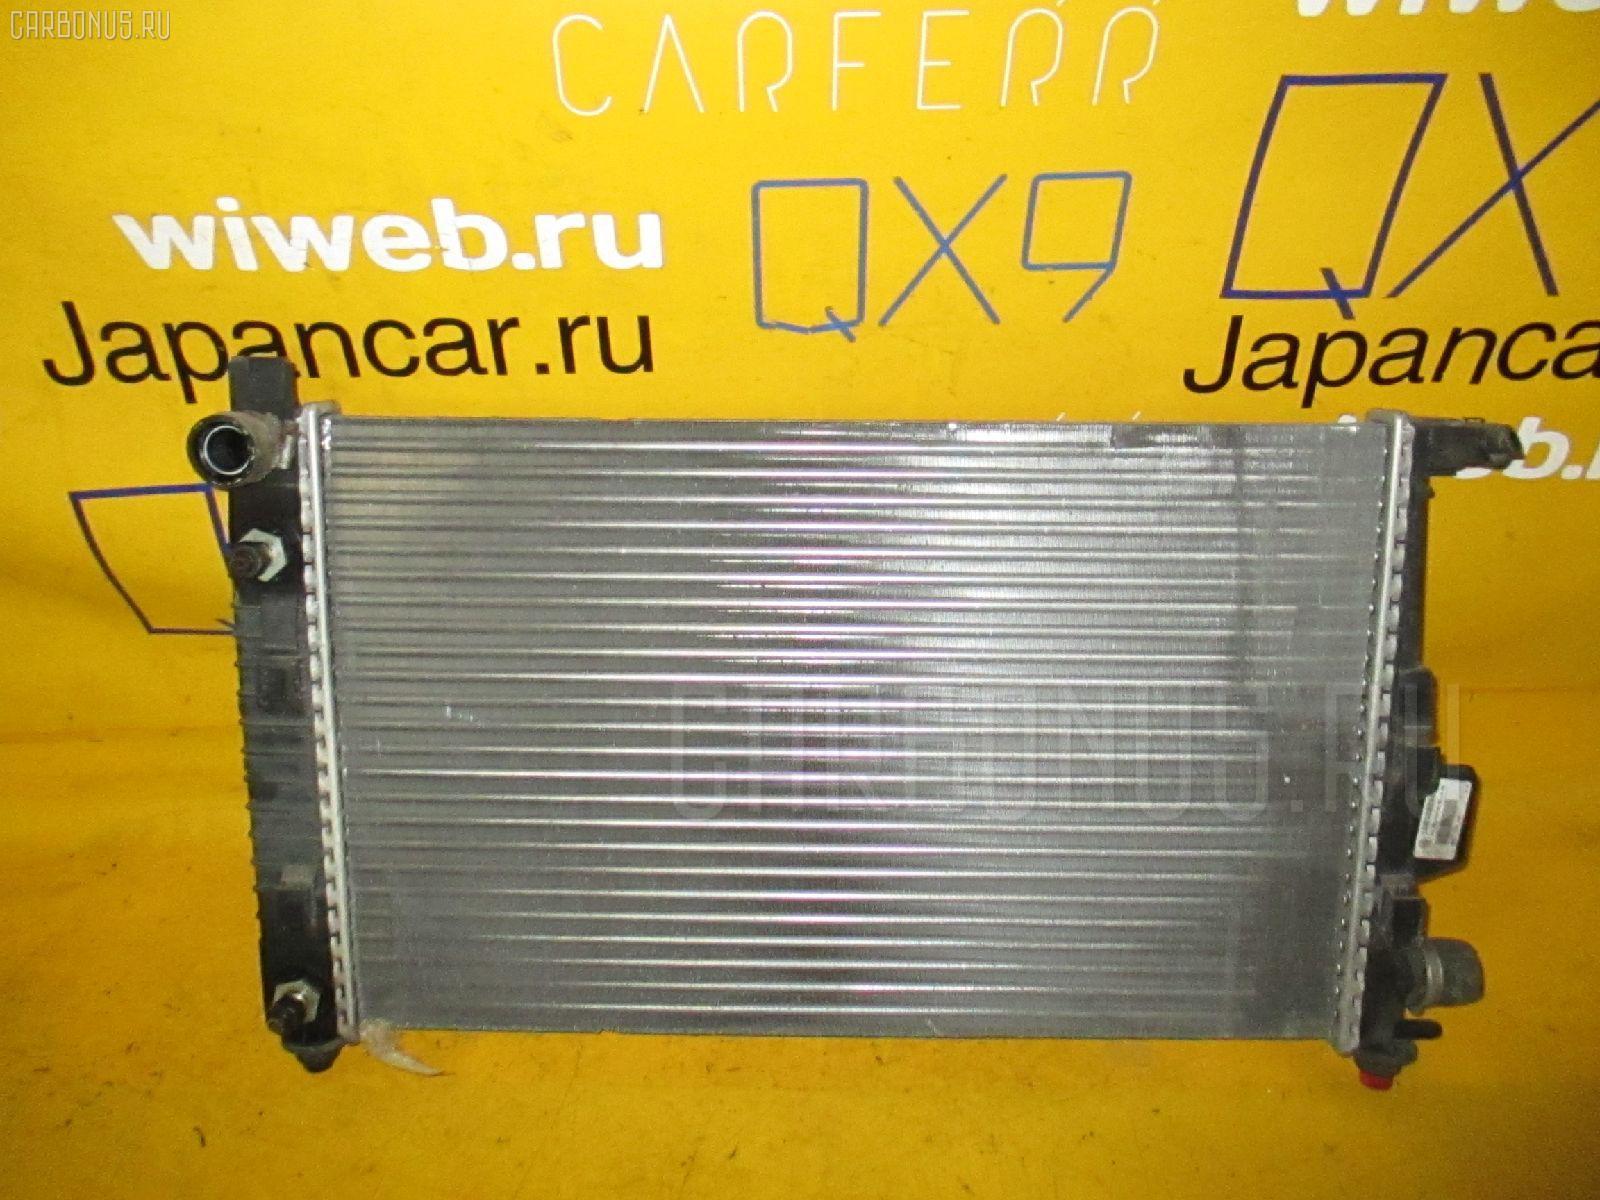 Радиатор ДВС MERCEDES-BENZ A-CLASS W168.133 166.960. Фото 11